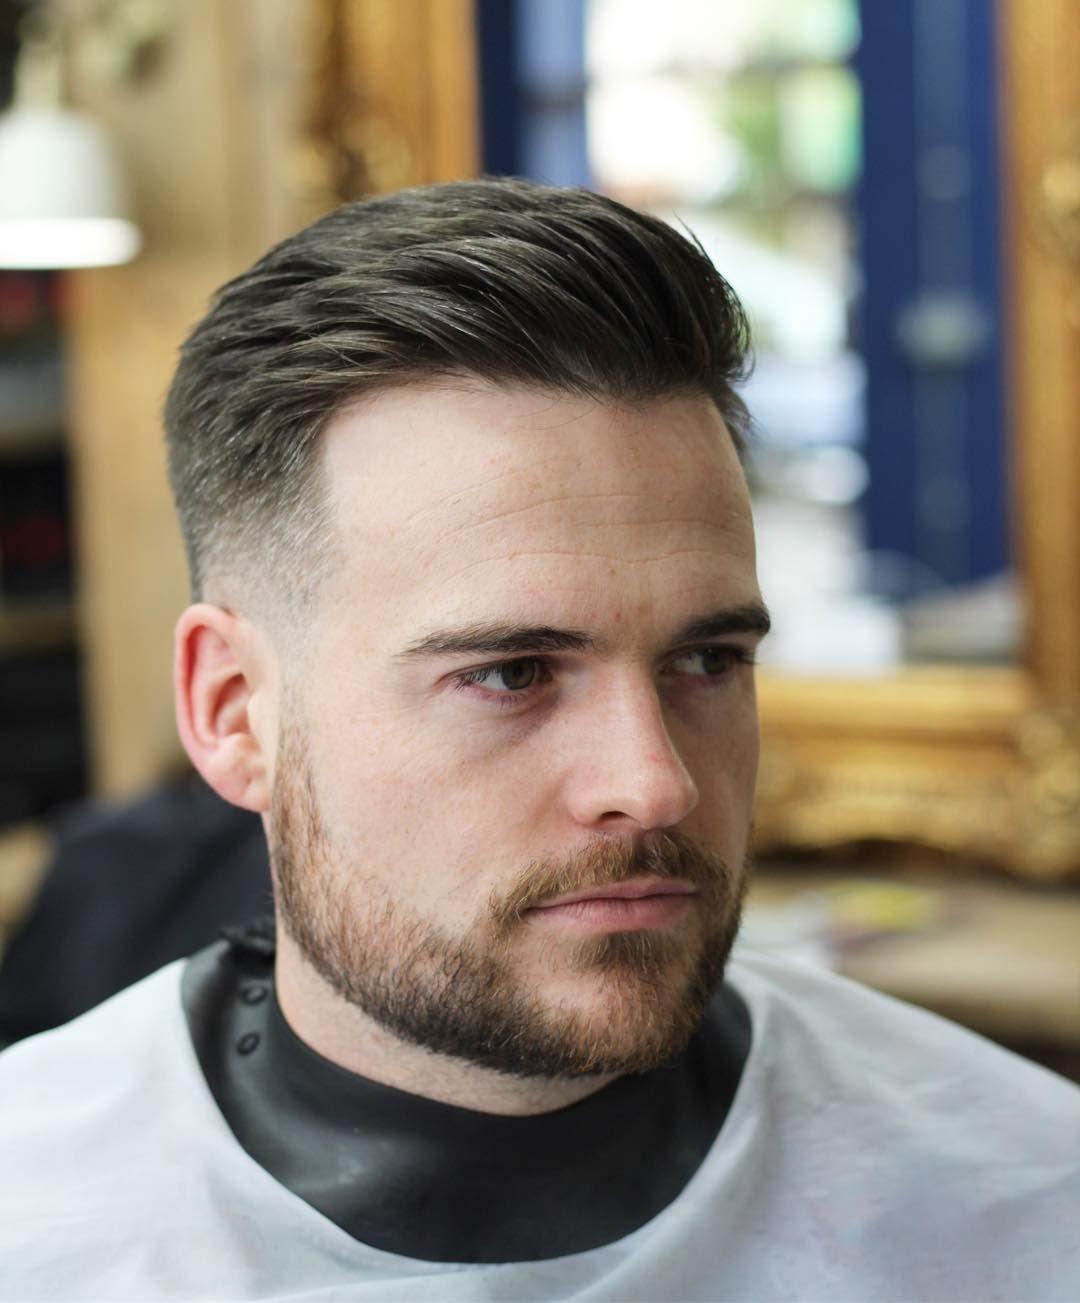 barber shops near me map haircut 2017 haircut styles